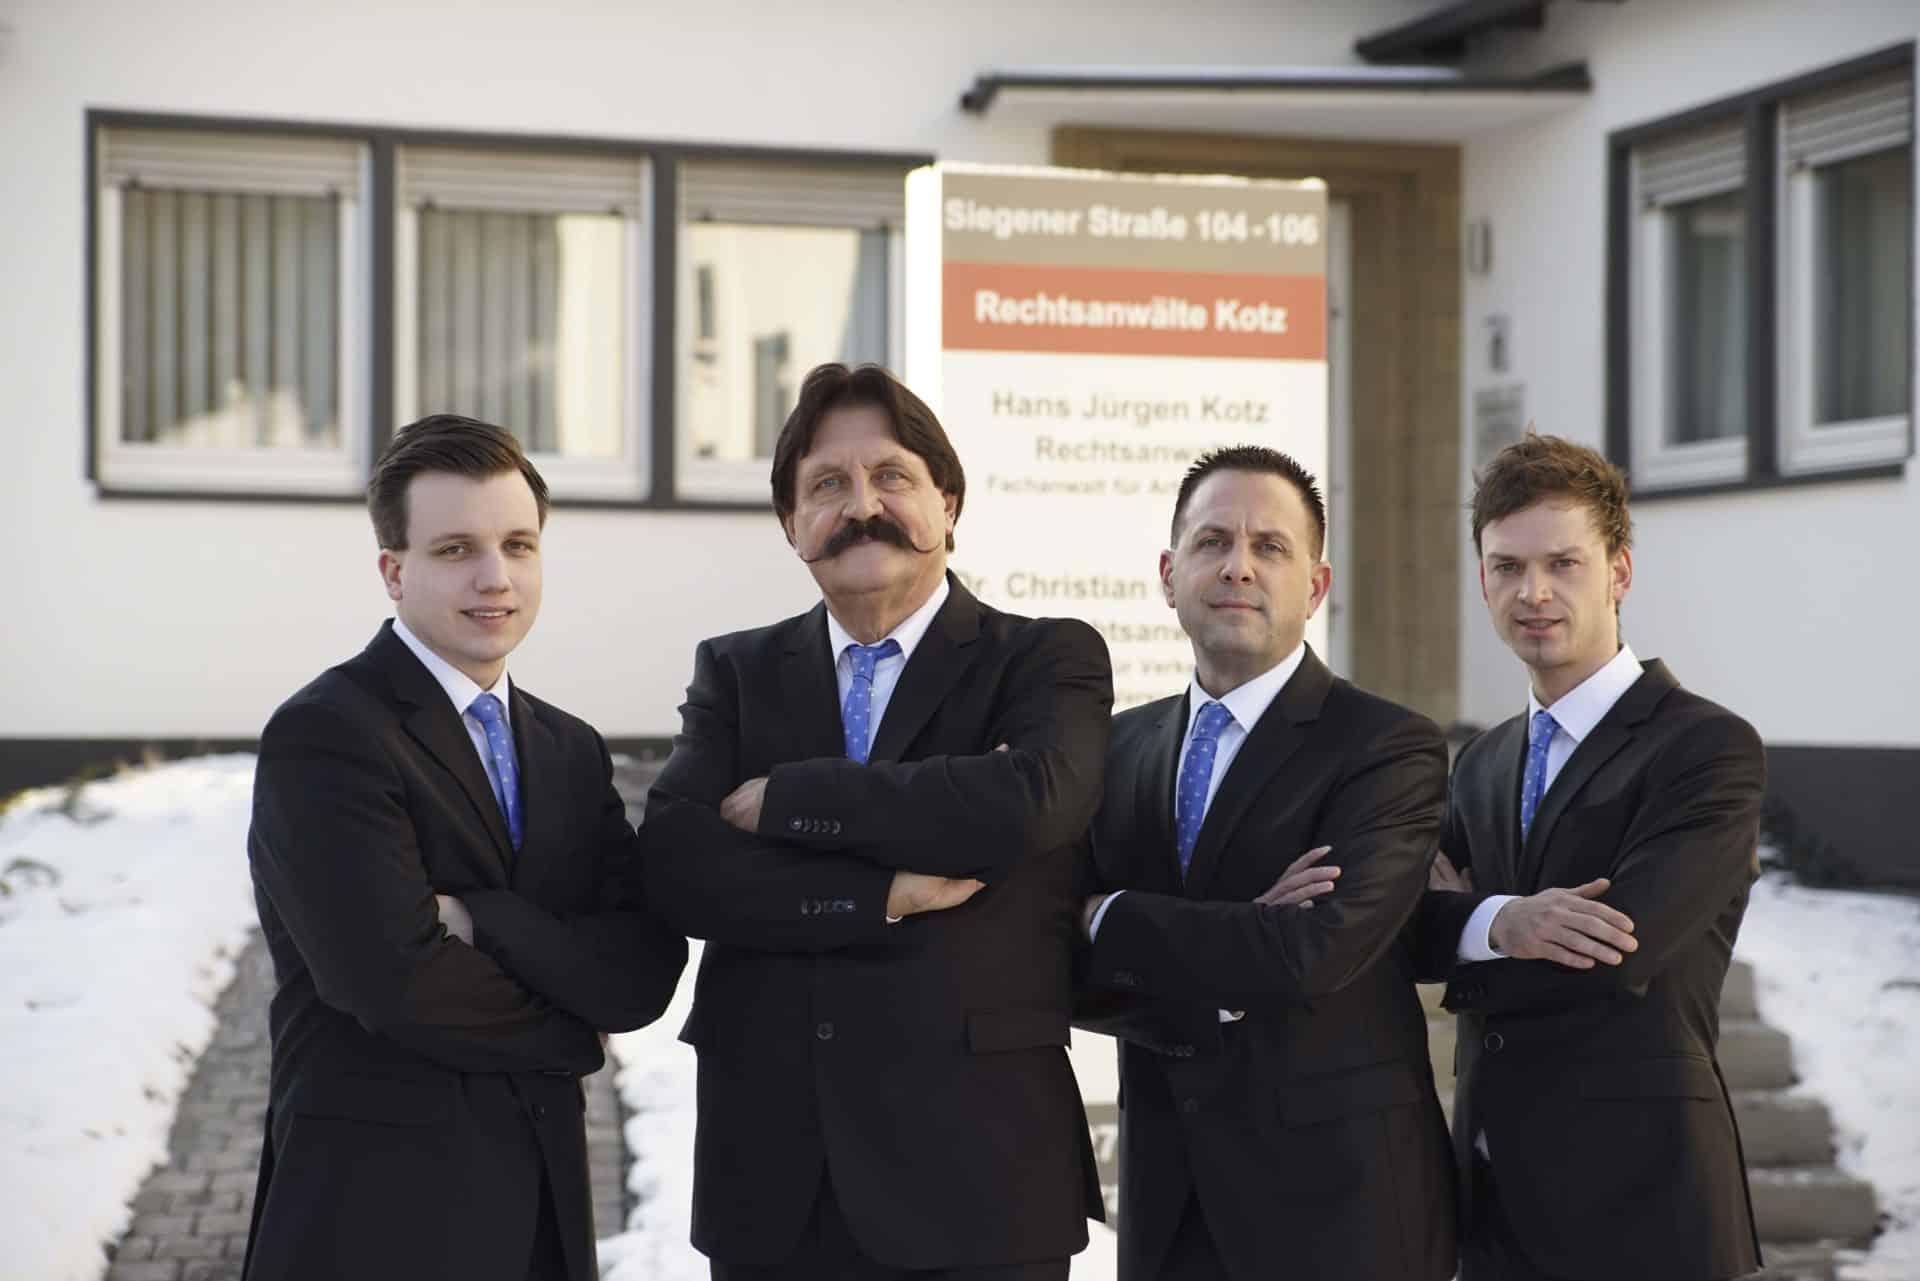 Rechtsanwälte Kotz GbR